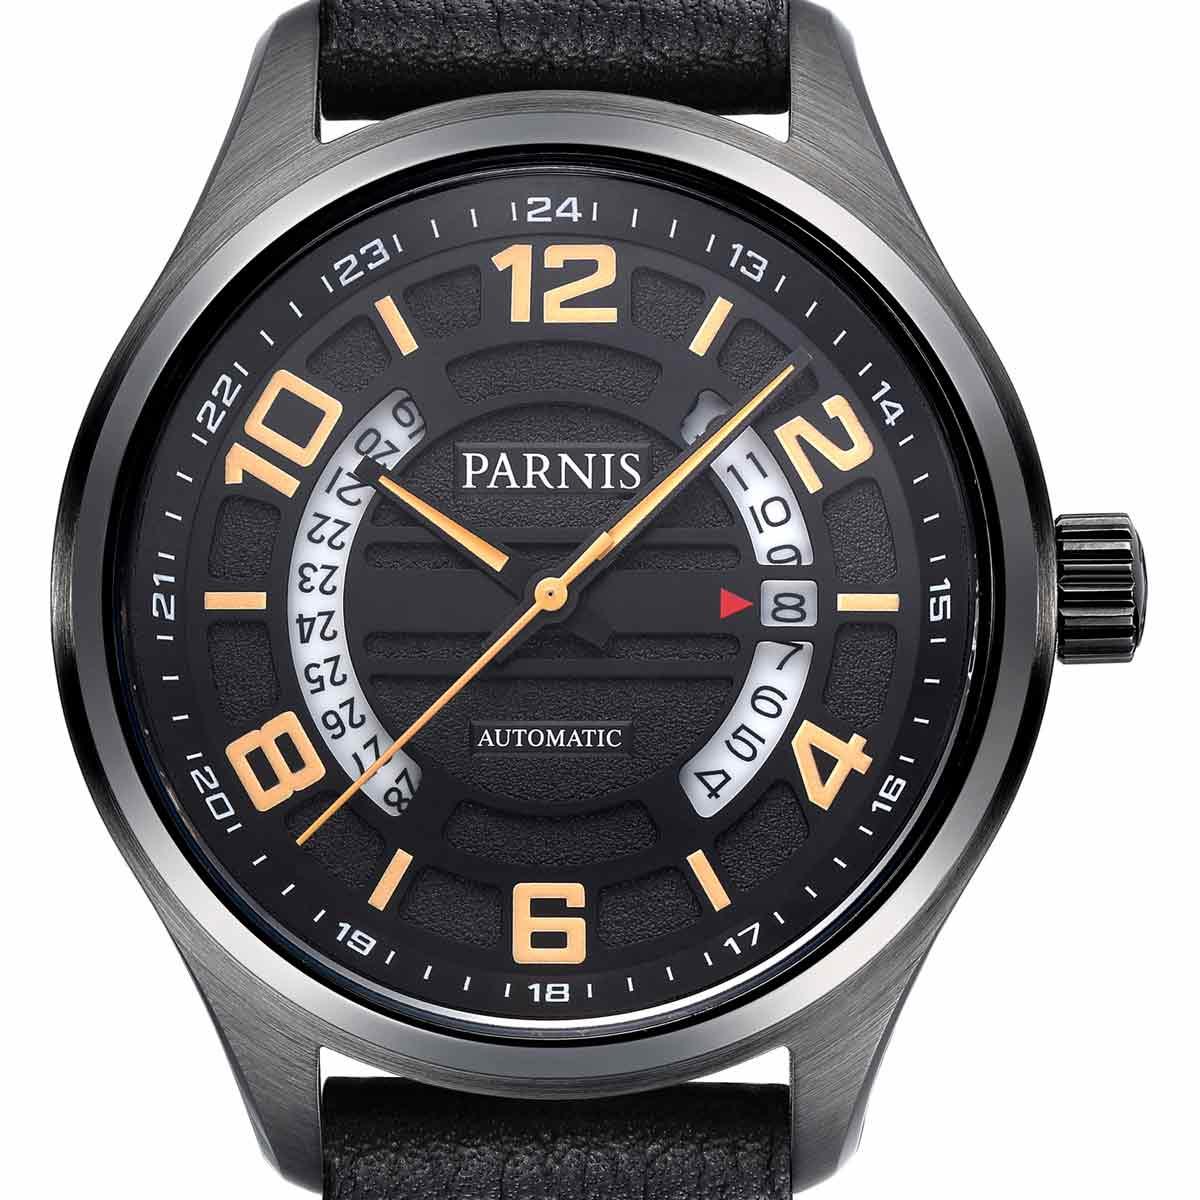 【NEW】PARNIS パーニス 自動巻き 腕時計 [PA6052-S3AL-BKorBK] 並行輸入品 純正ケース メーカー保証12ヶ月